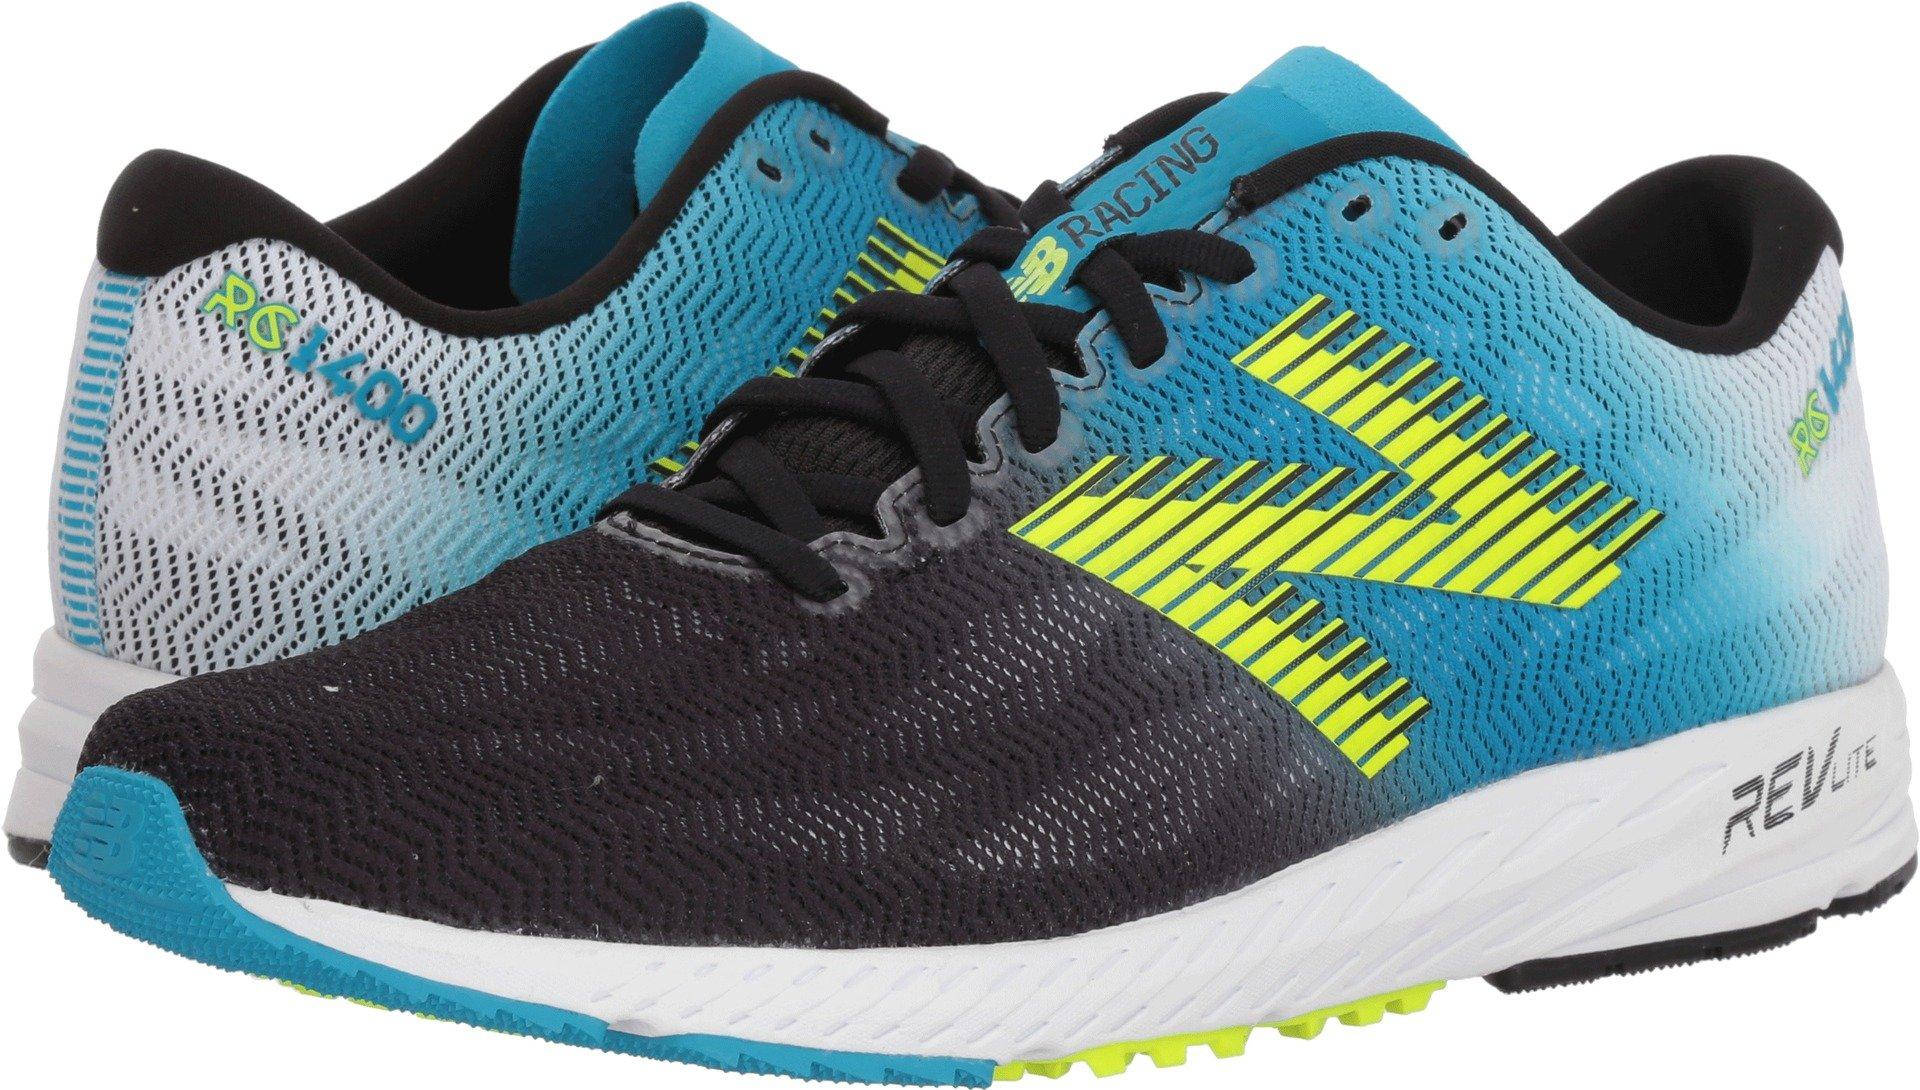 los angeles e1c23 dc10f New Balance Men's 1400v6 Running Shoe, Blue/Black, 13 D US